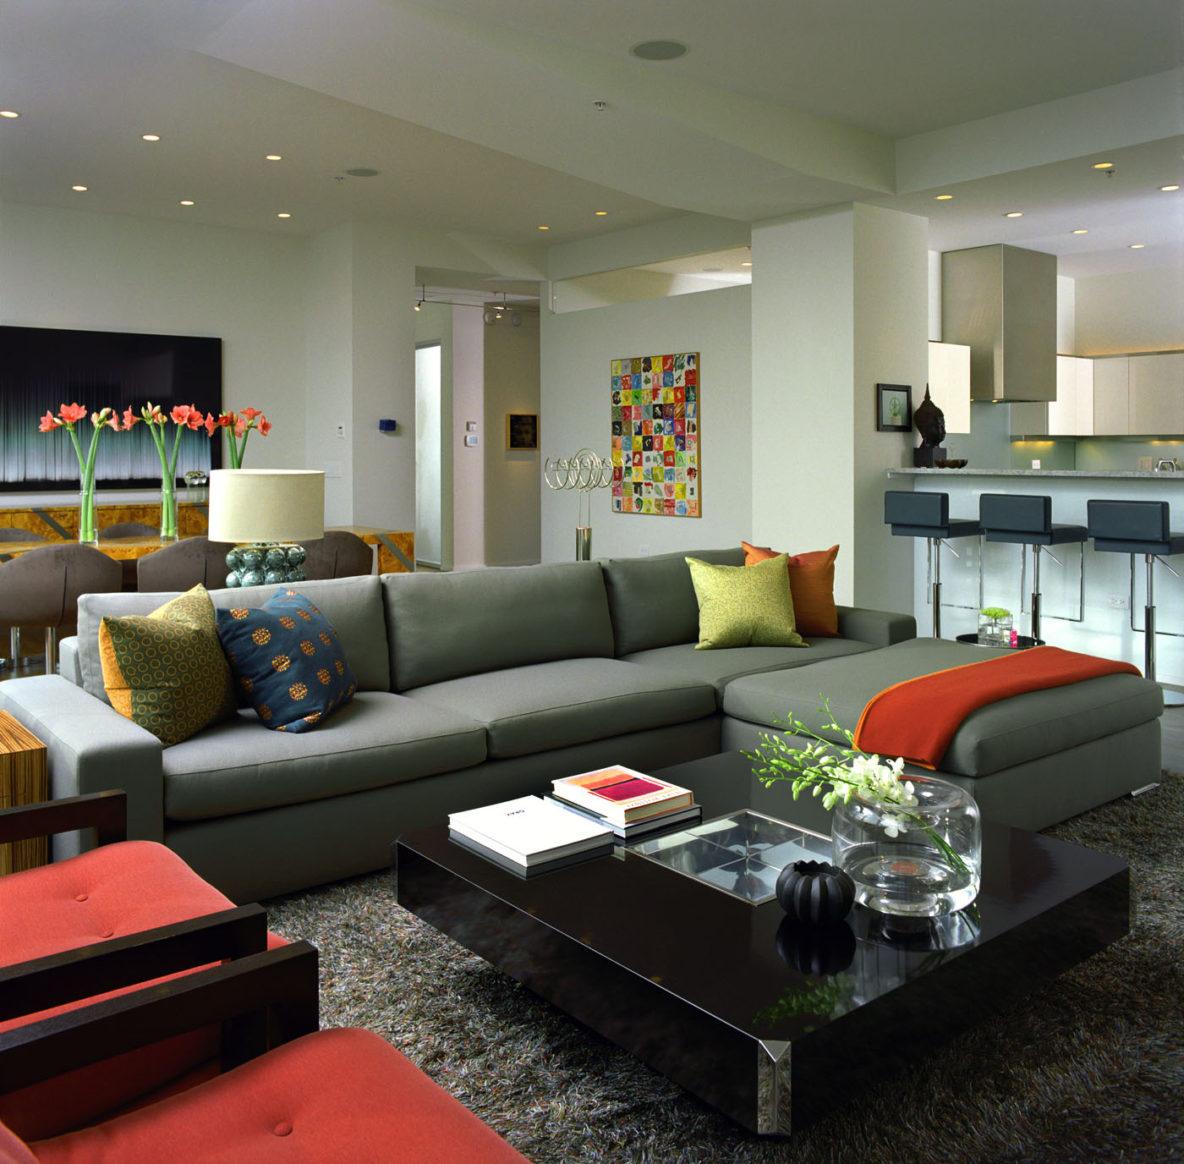 ggc-p18-montgomery-livingroom1